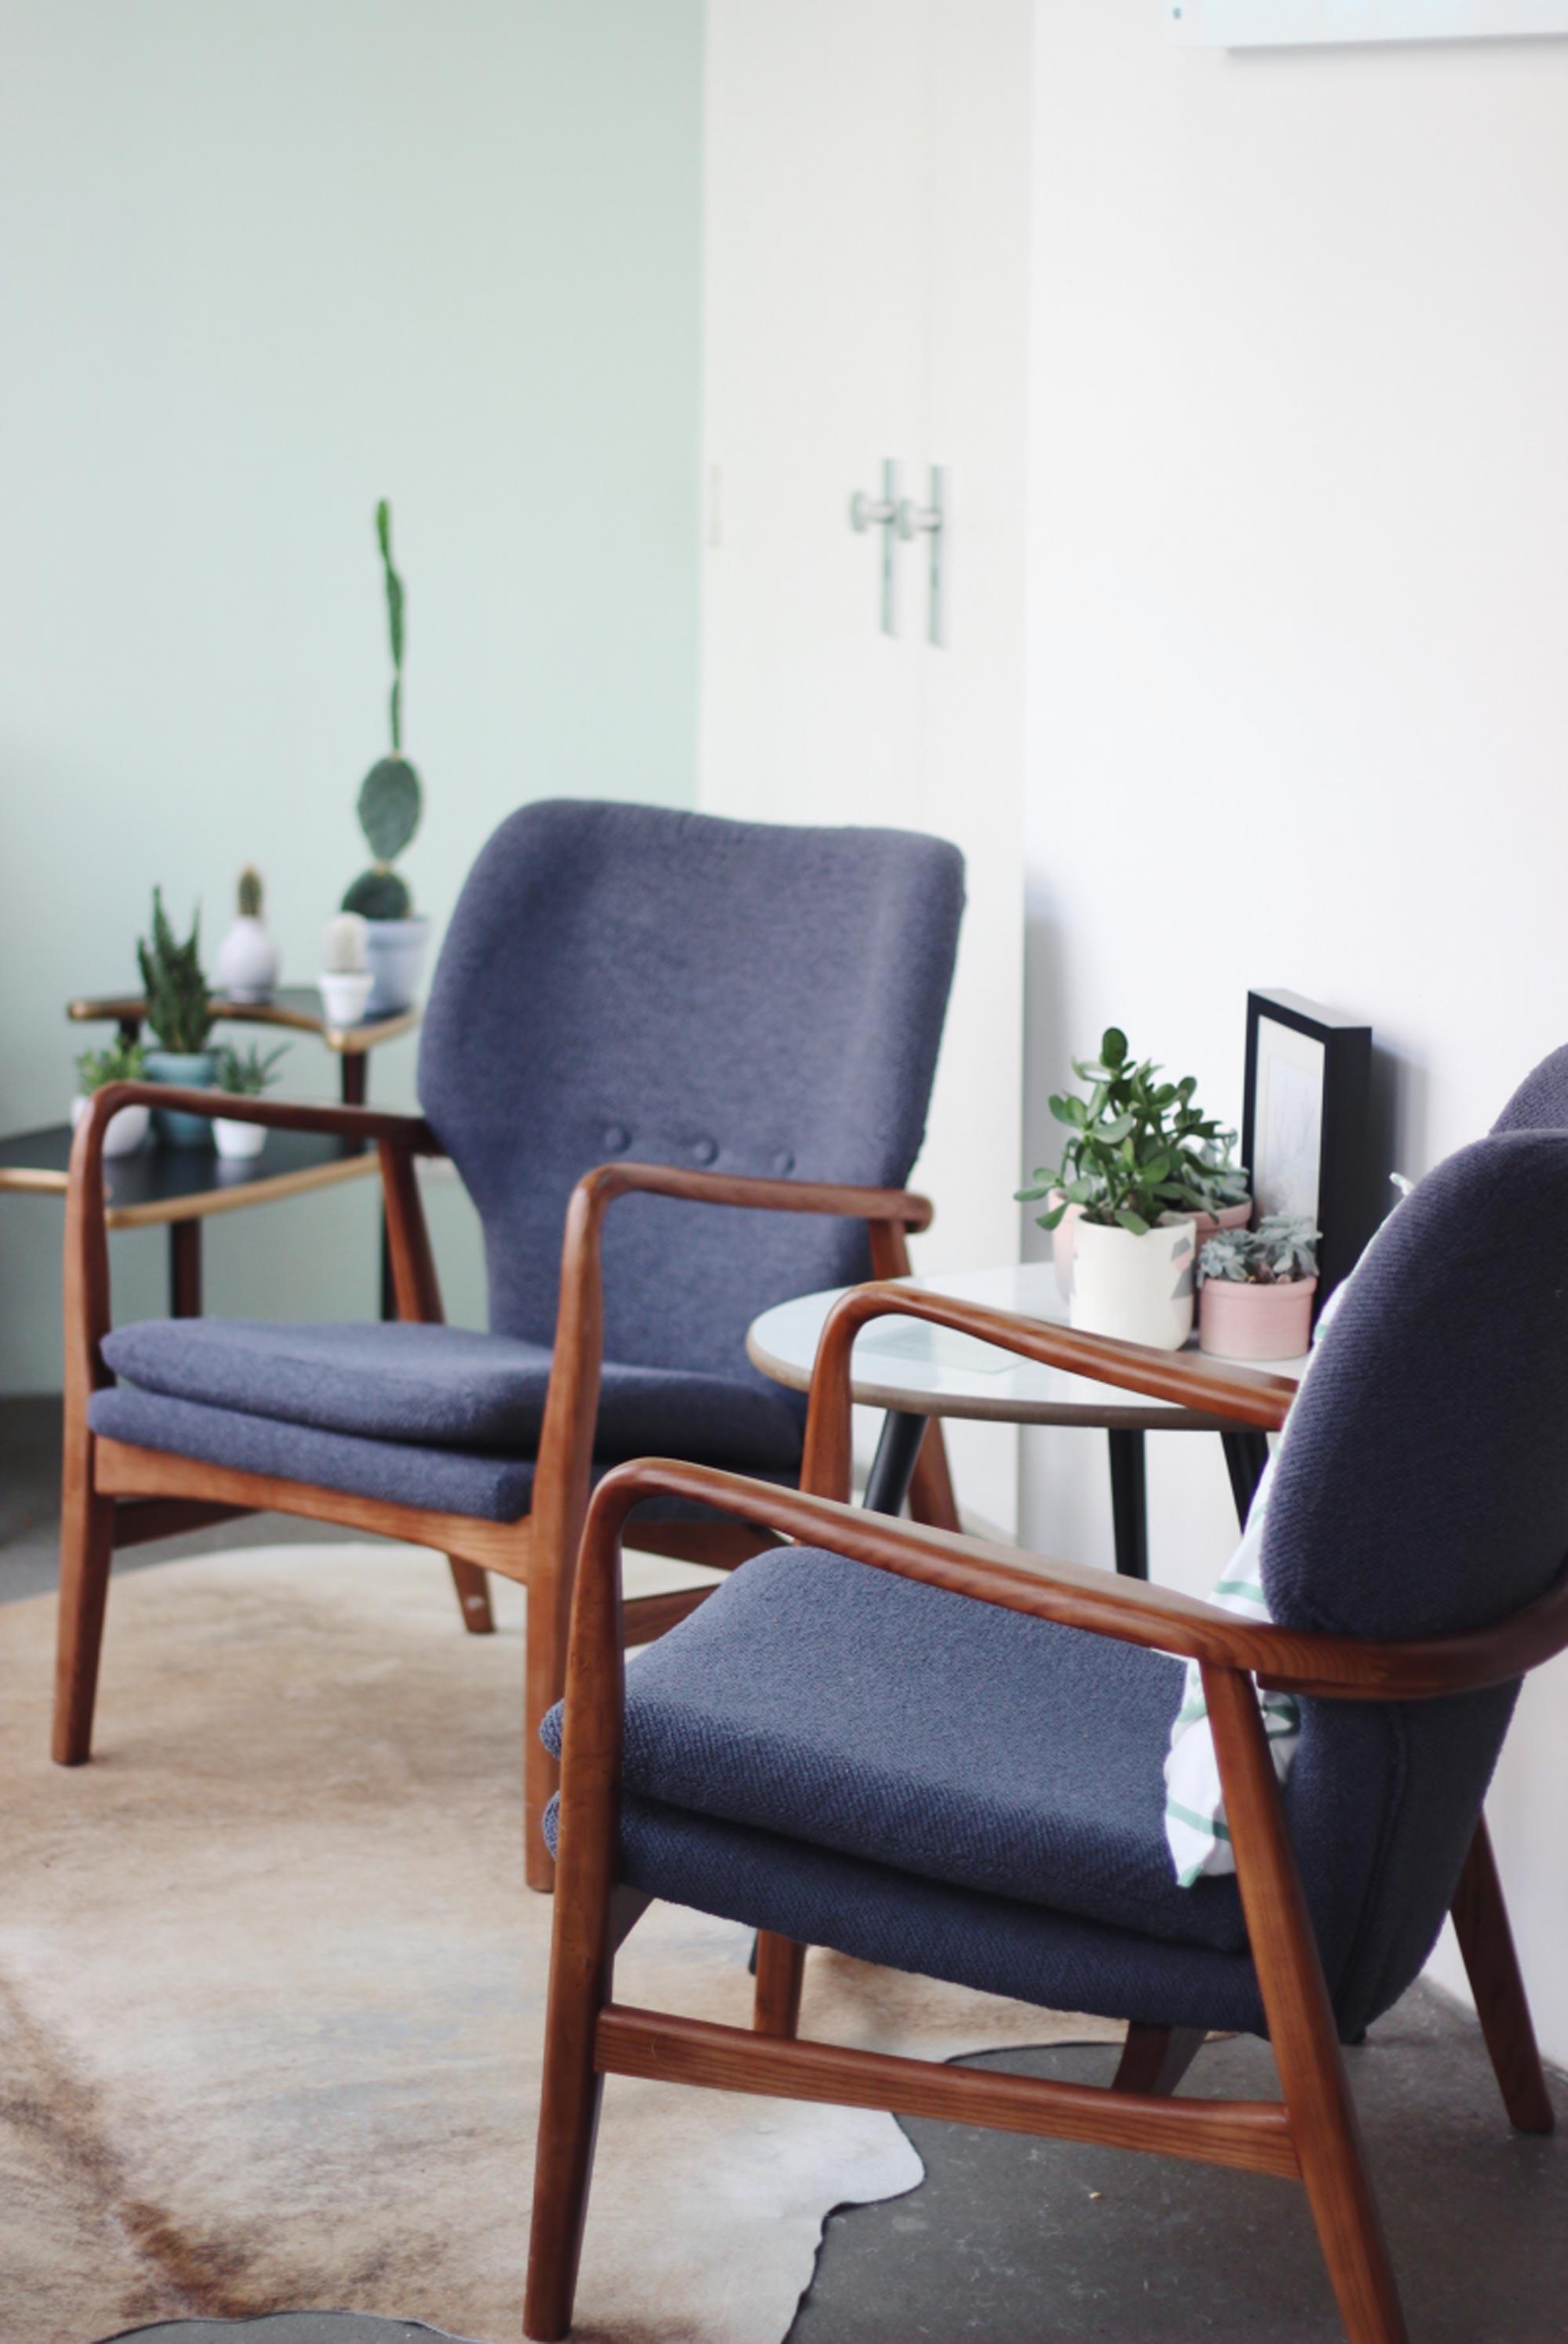 hotspot stoelen